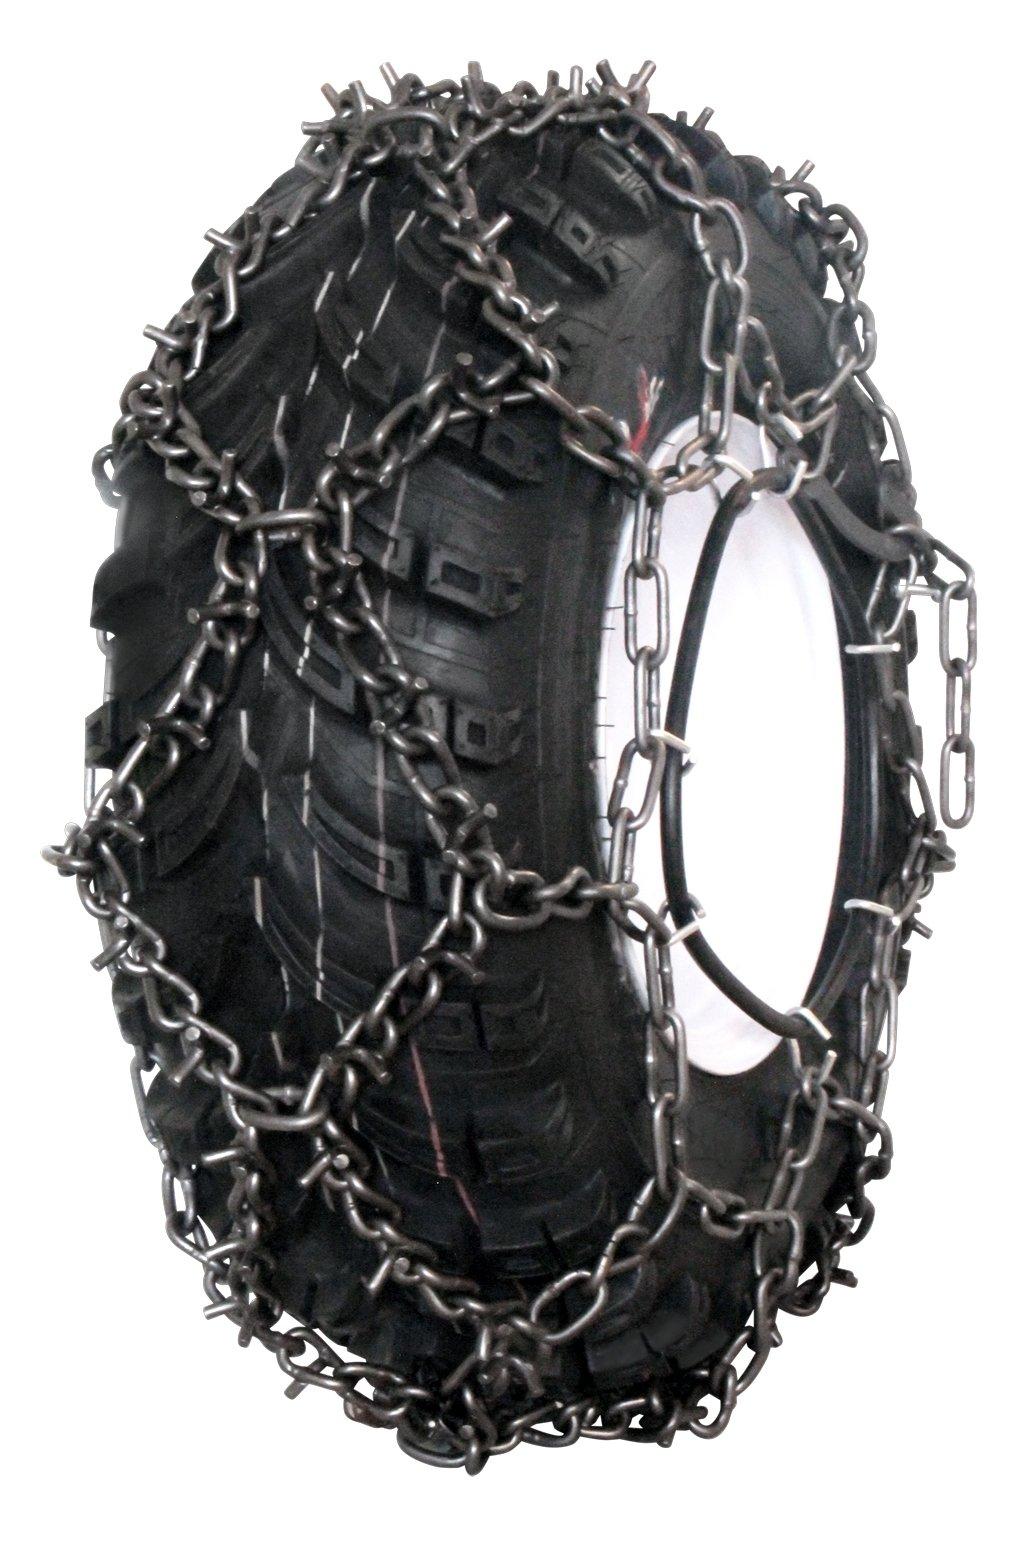 Grizzlar GTN-704 ATV Diamond Studded Tire Chains 205/80-12 21x10-8 22x10-8 22x10-10 22x11-10 22x11-12 23x8-10 23x8-12 23x8.50-12 23x10-10 23x10-12 23x10.50-12 24x8-12 24x9-12 25x8-12 26x8-12 26x8-15 by Grizzlar (Image #1)